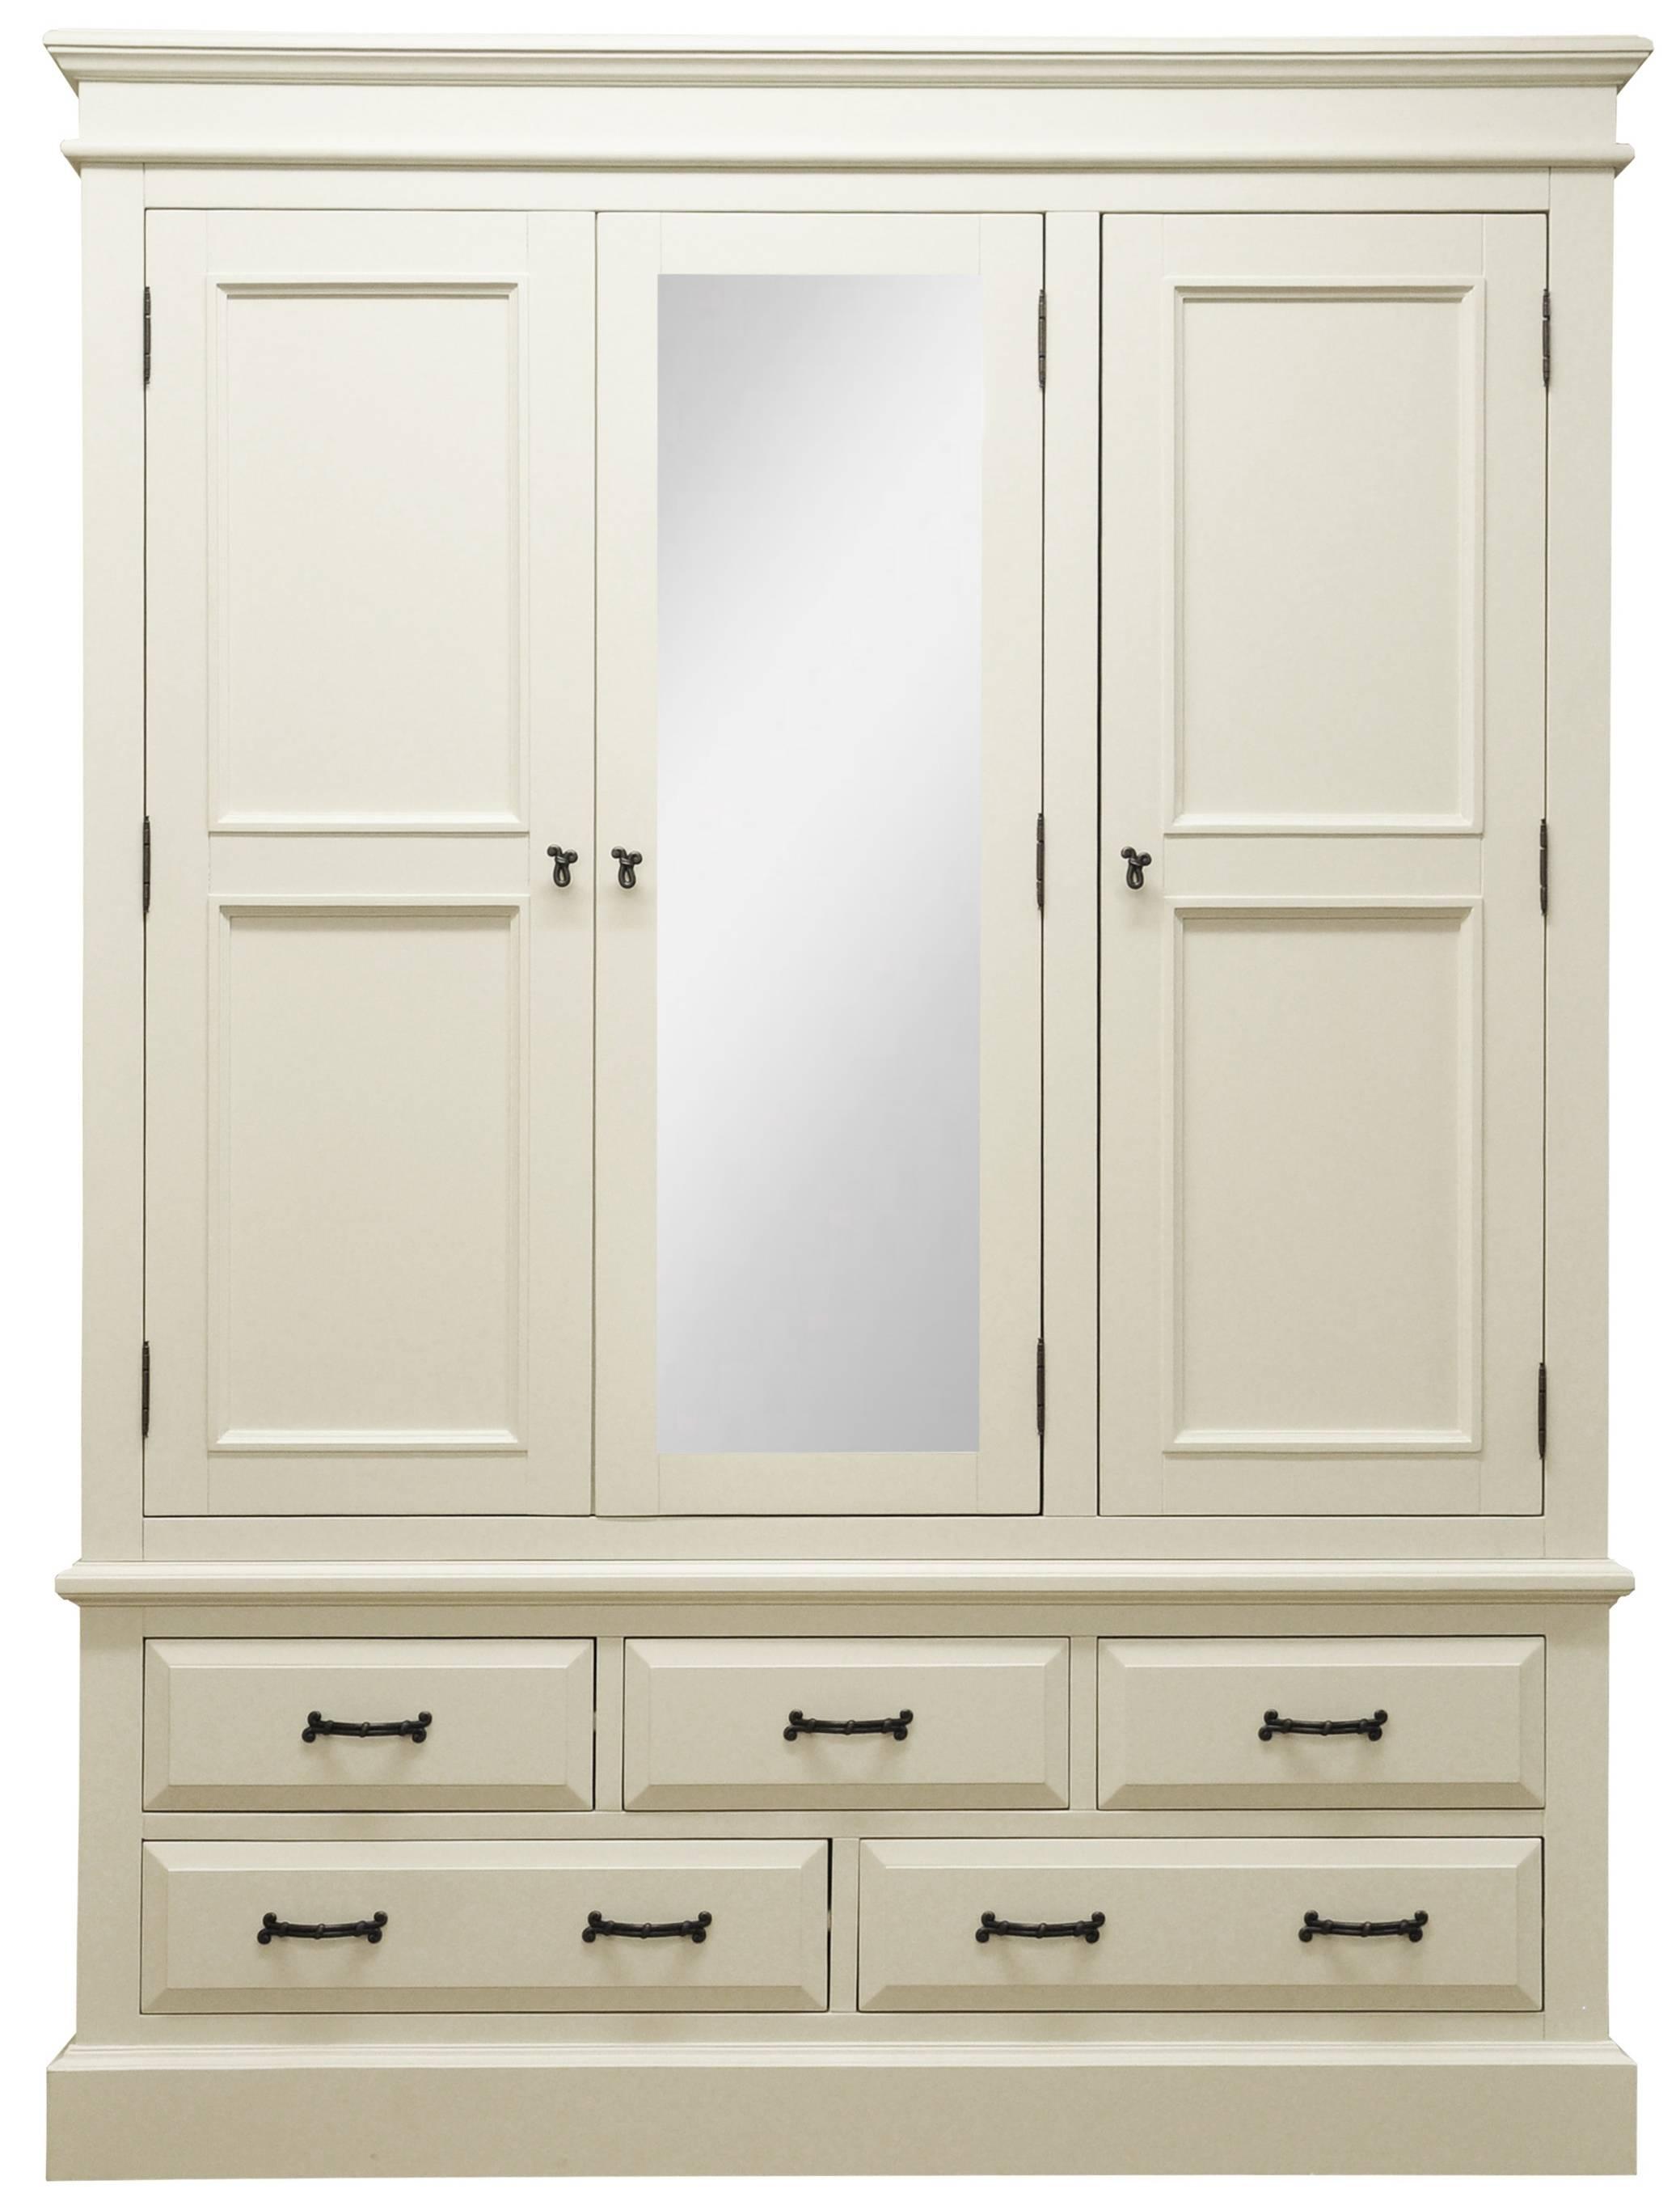 Wardrobes : Henleaze 5 Drawer Painted Wardrobe With Mirrorhenleaze in Triple Wardrobes With Drawers (Image 15 of 15)